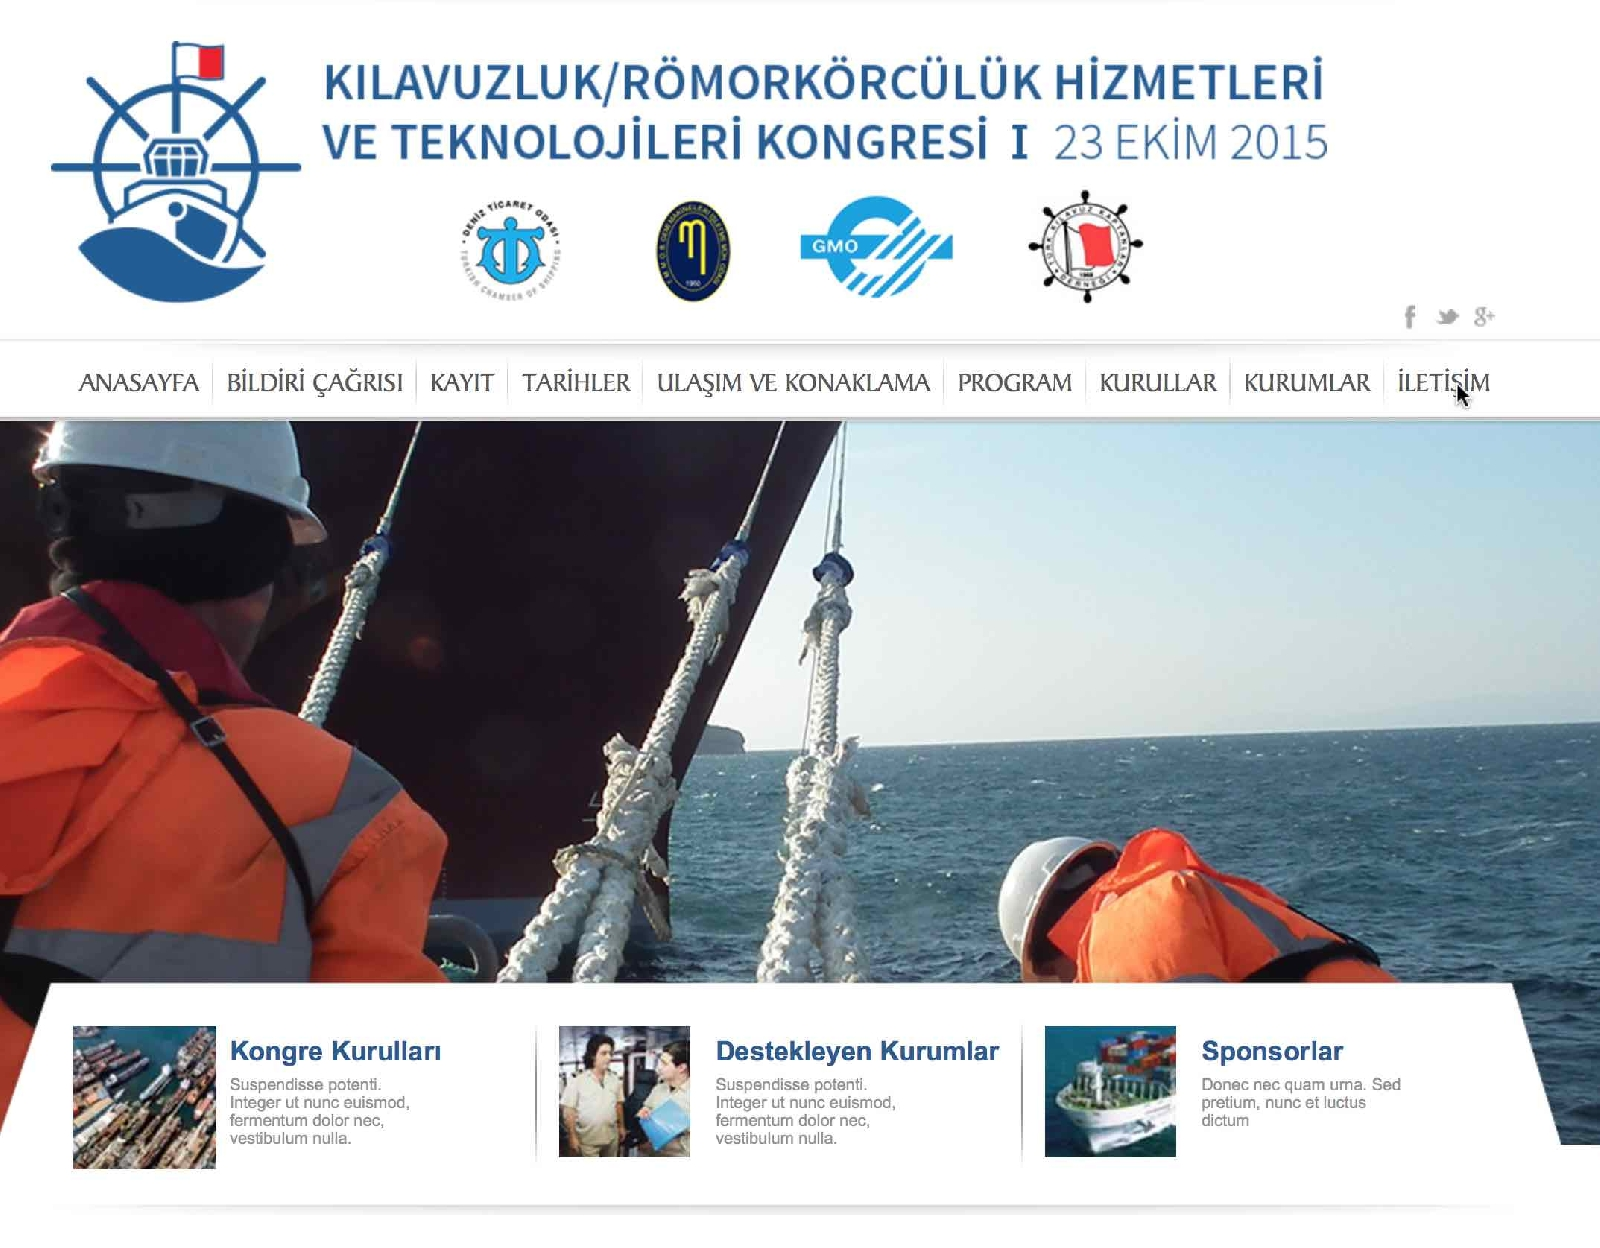 Turkey to organize pilotage congress